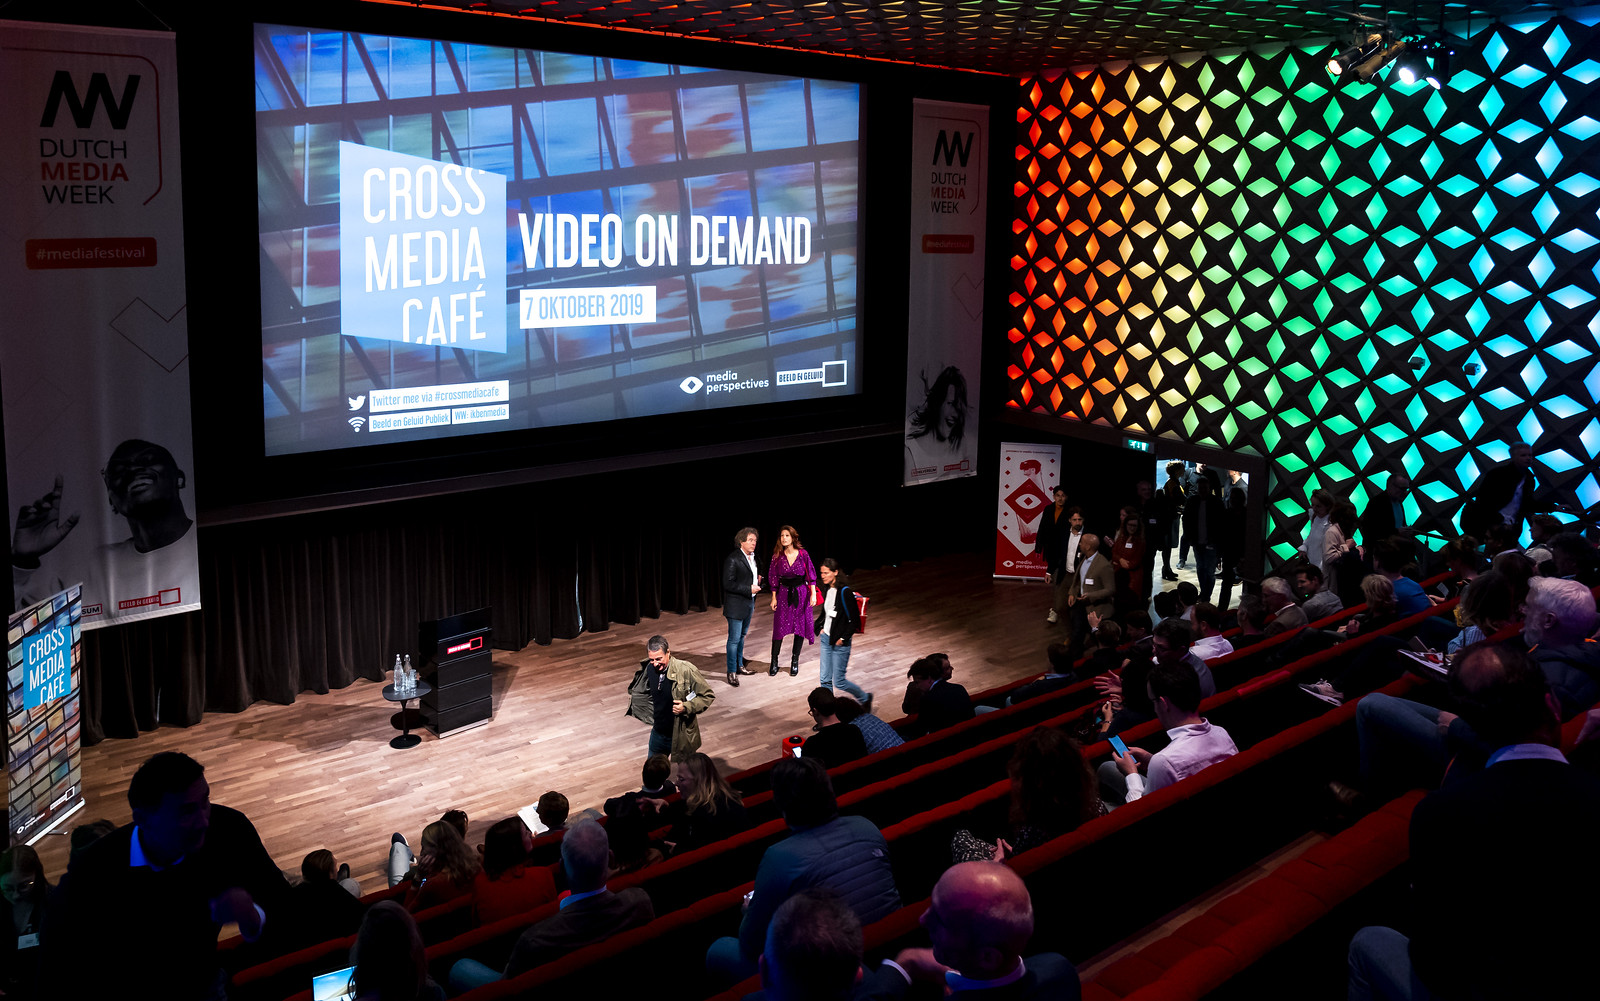 Cross Media Café Video on Demand